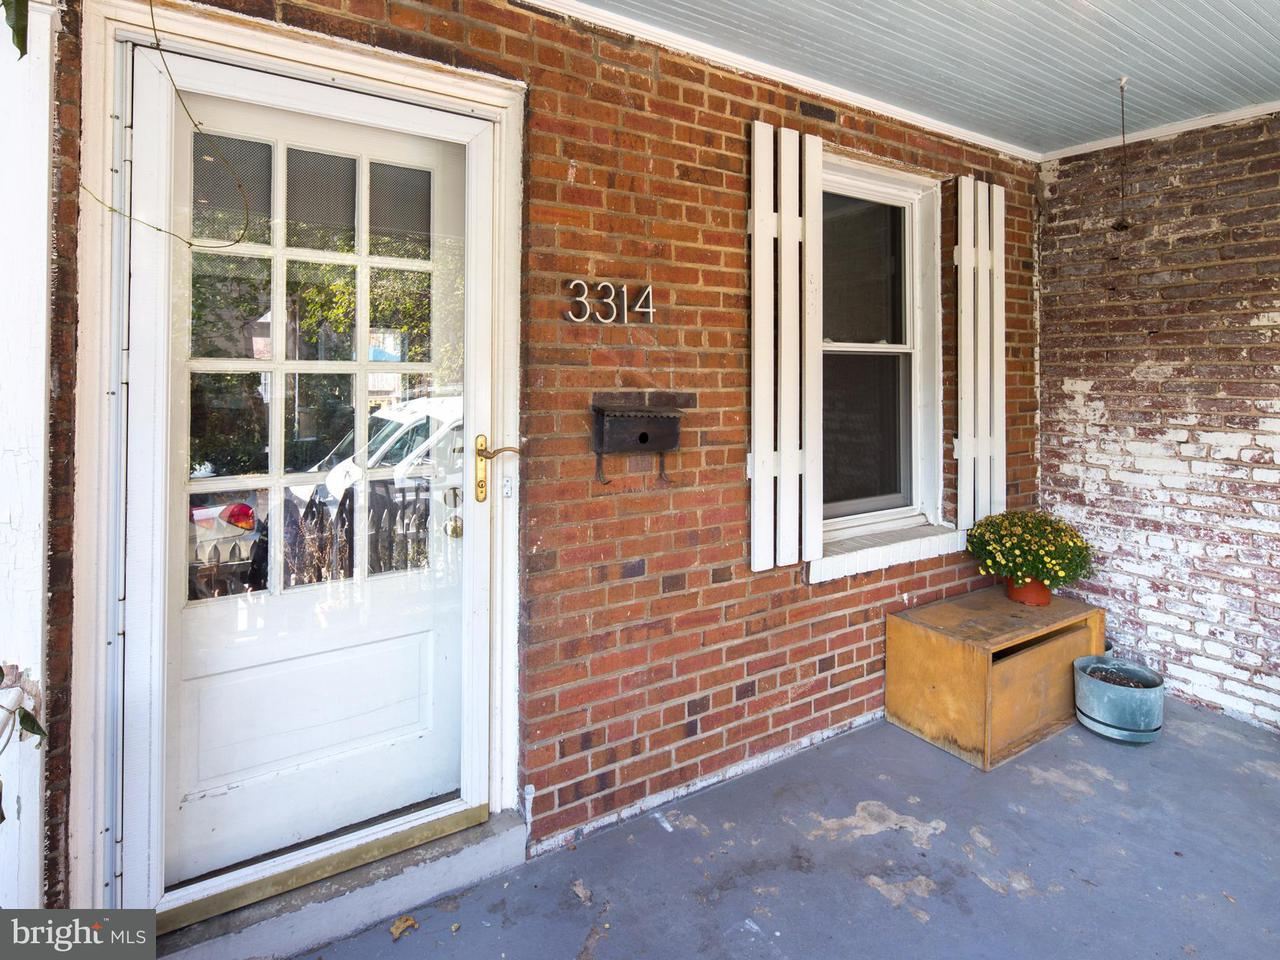 Additional photo for property listing at 3314 Brown St Nw 3314 Brown St Nw Washington, Περιφερεια Τησ Κολουμπια 20010 Ηνωμενεσ Πολιτειεσ